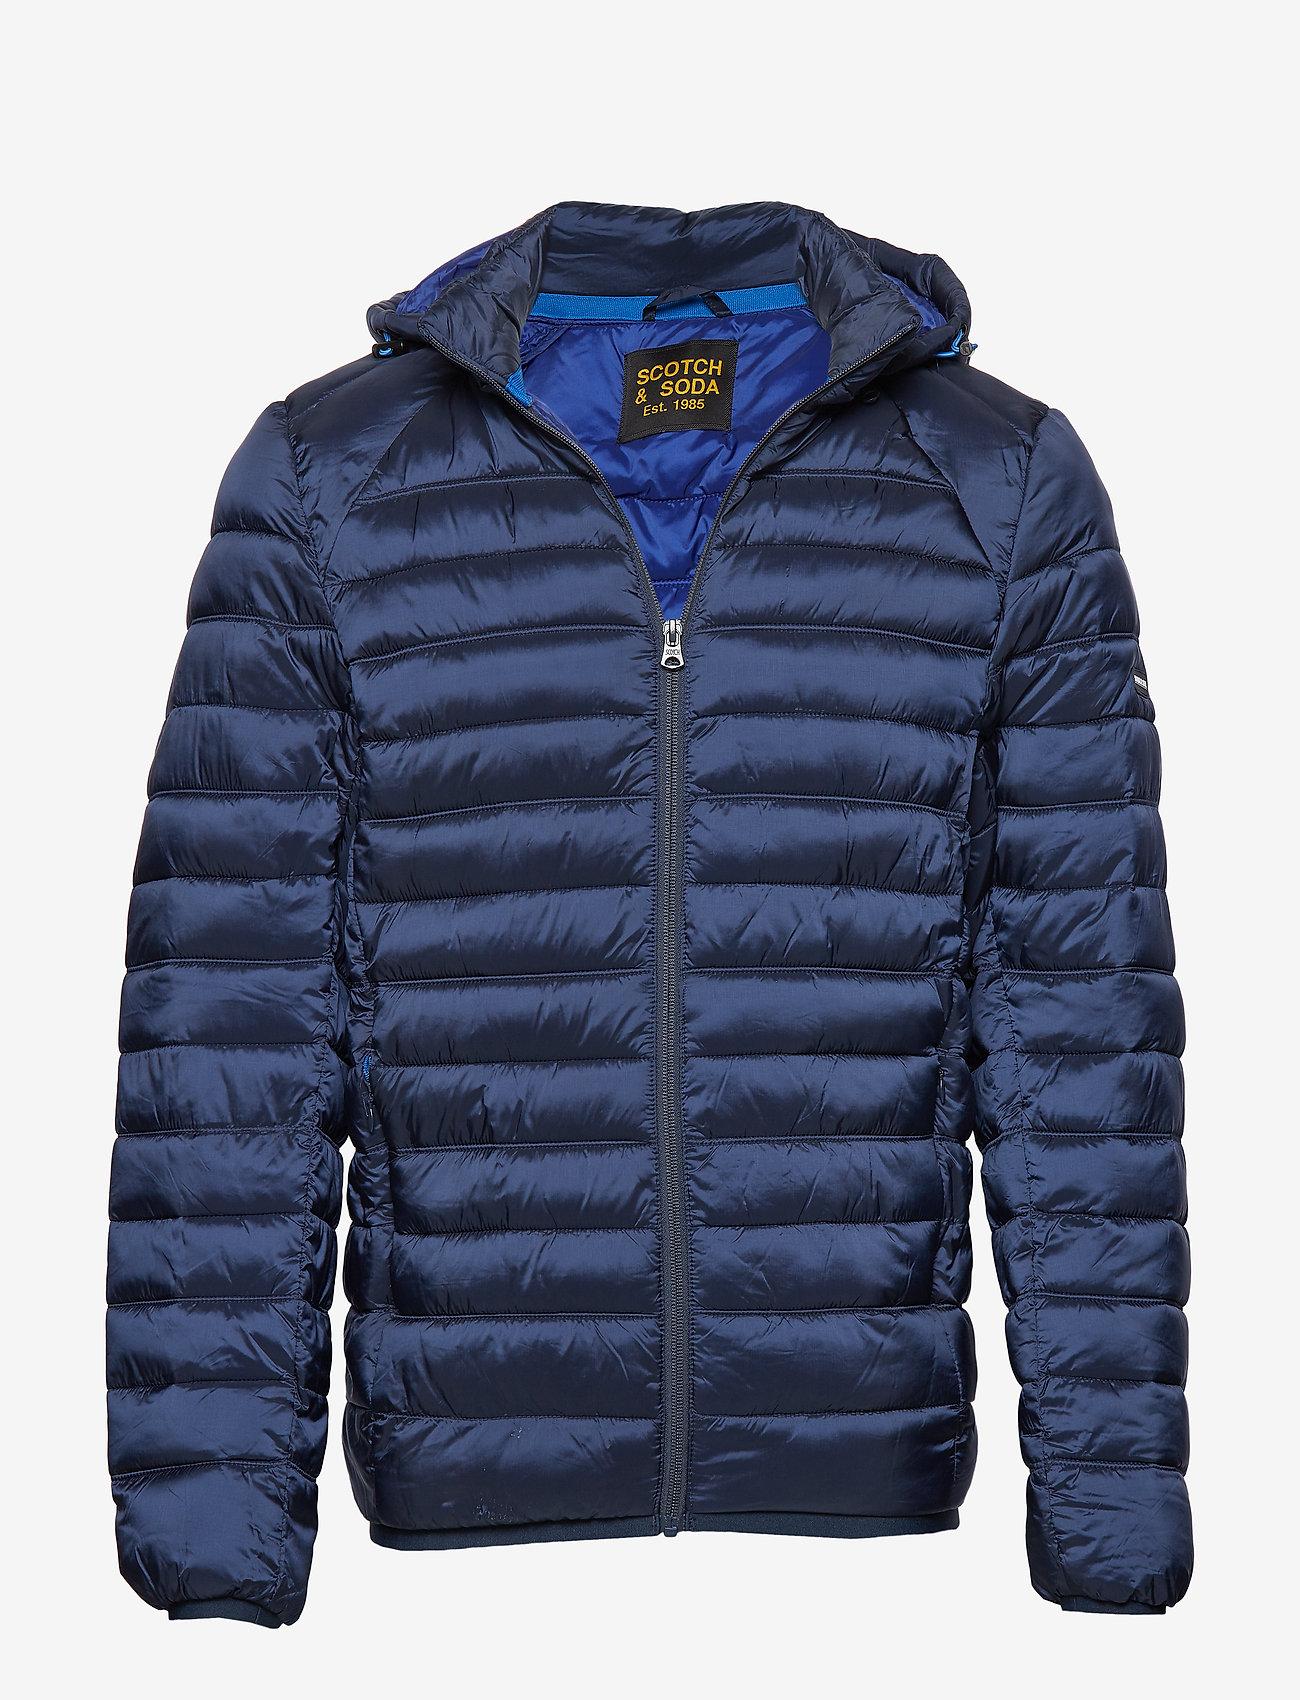 Scotch & Soda - Classic hooded light weight padded jacket - vestes matelassées - navy - 0